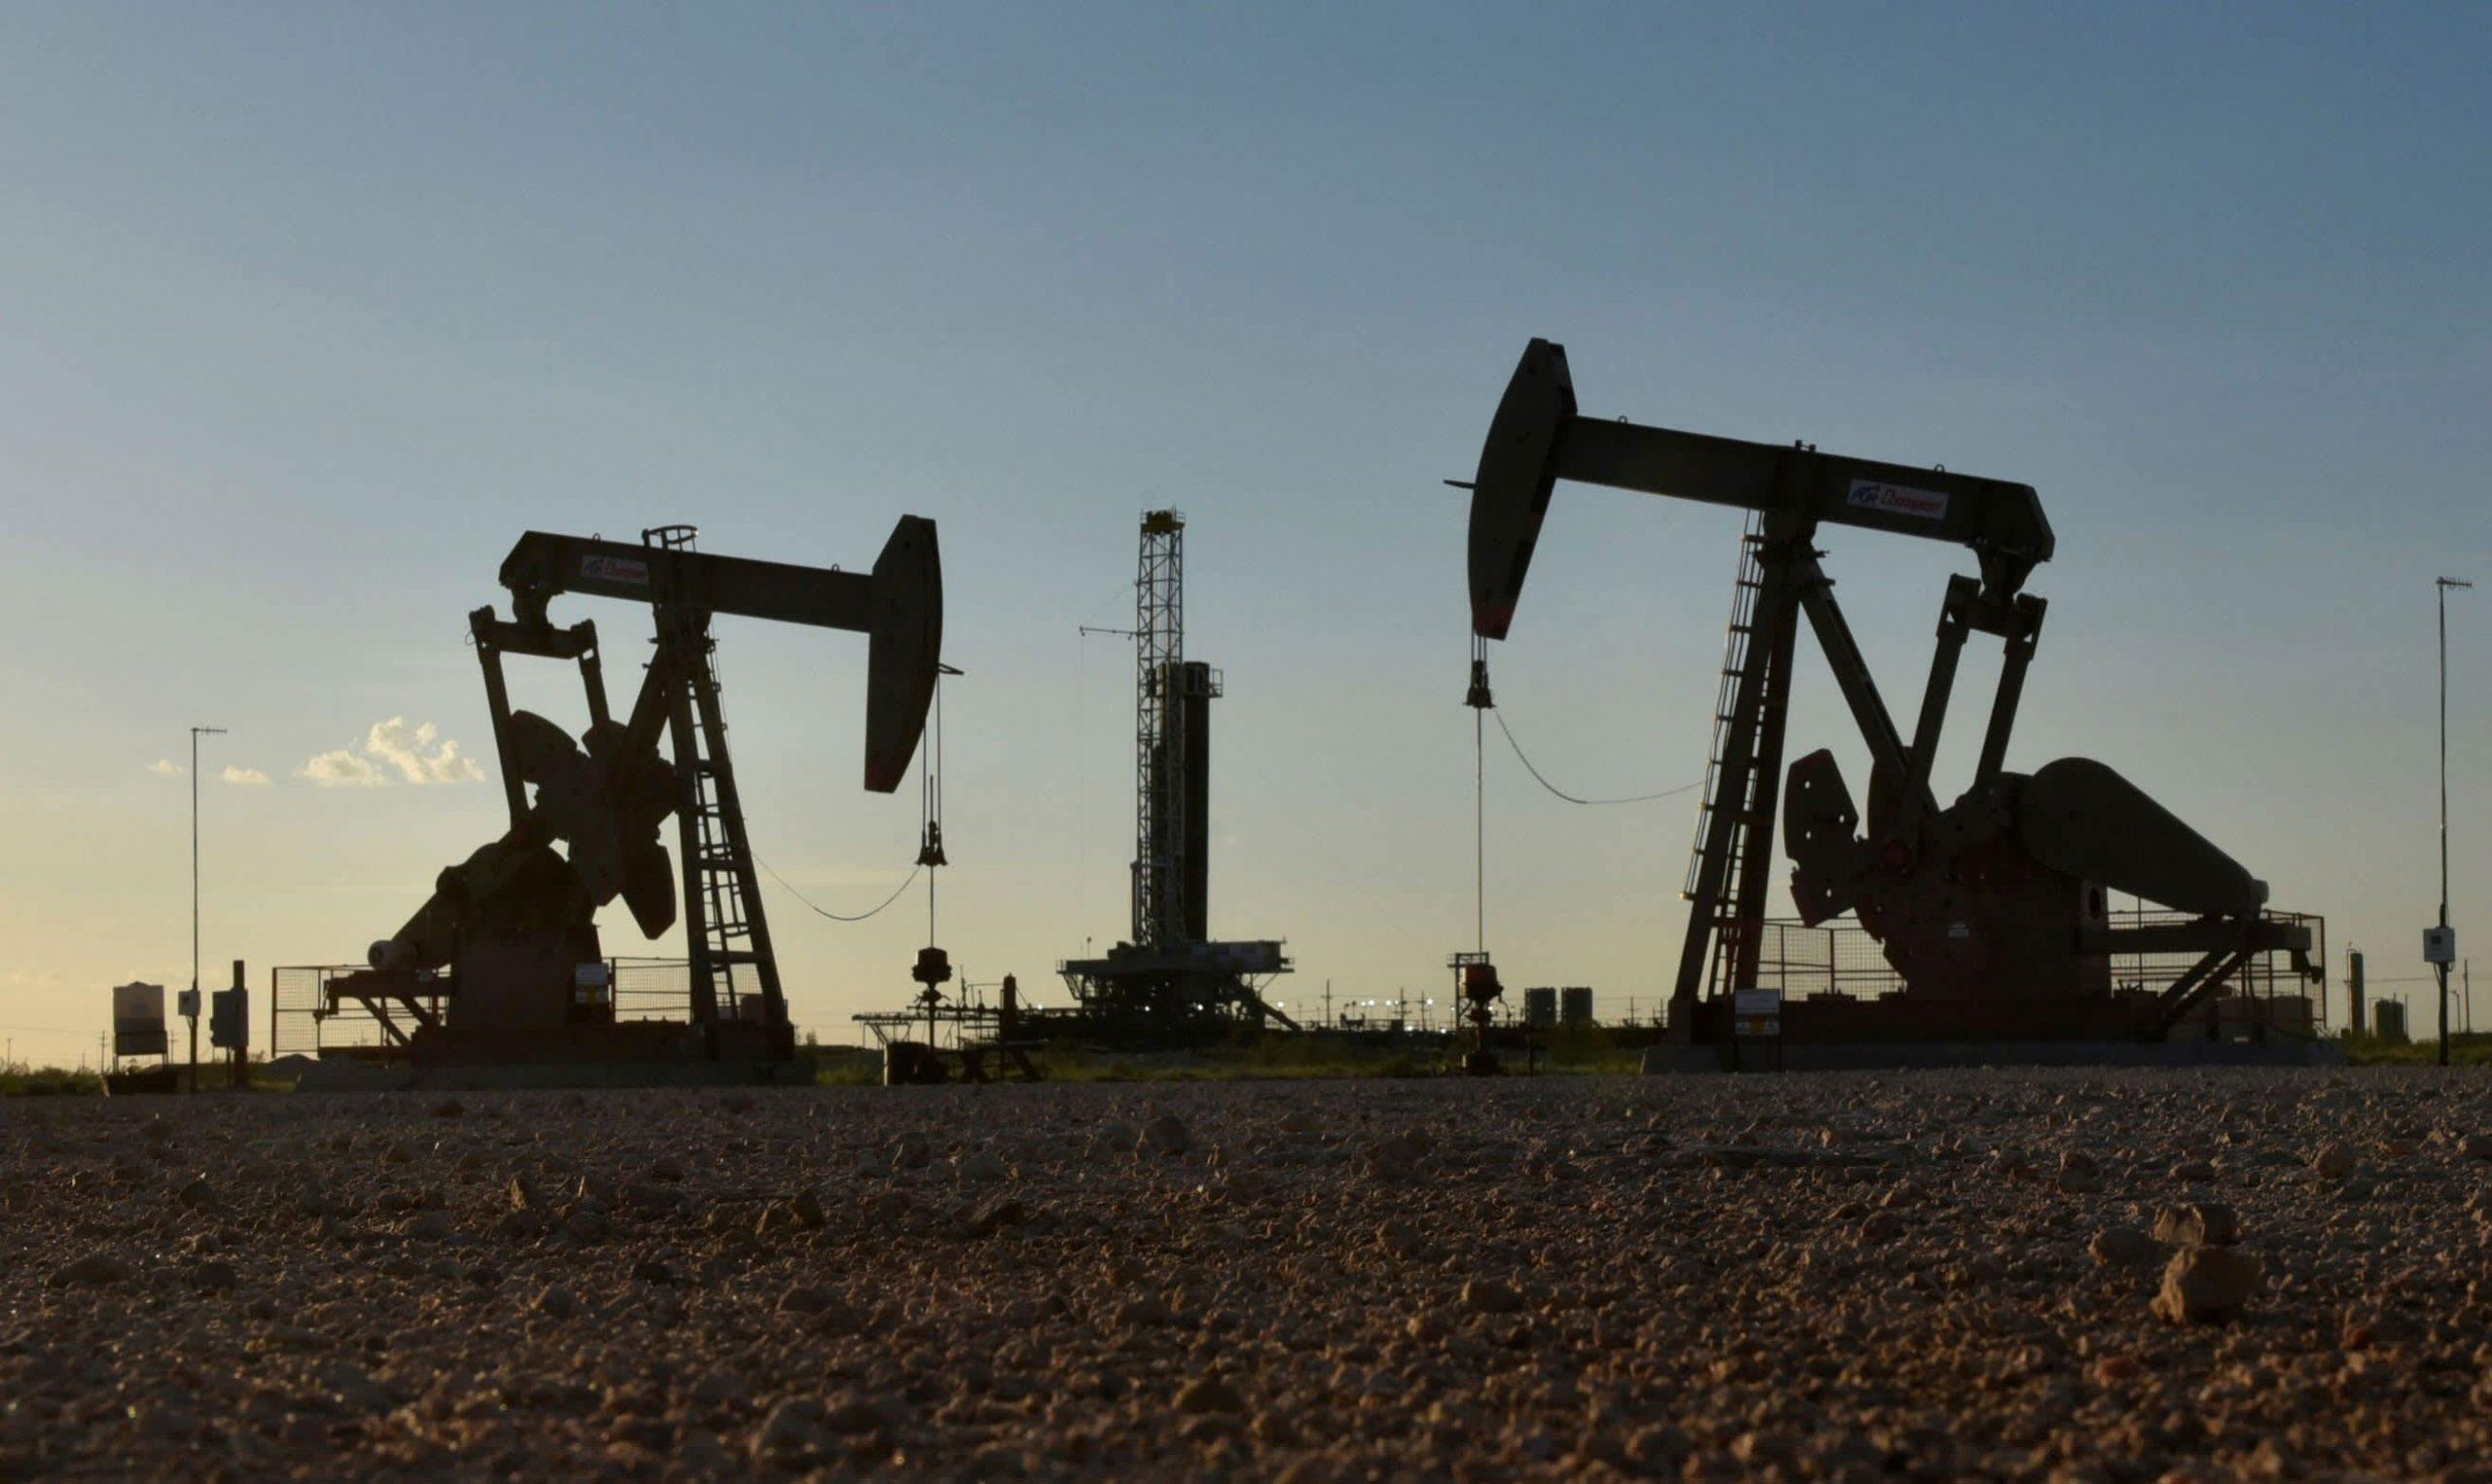 OPEC raises 2021 demand growth forecast on hope pandemic wanes